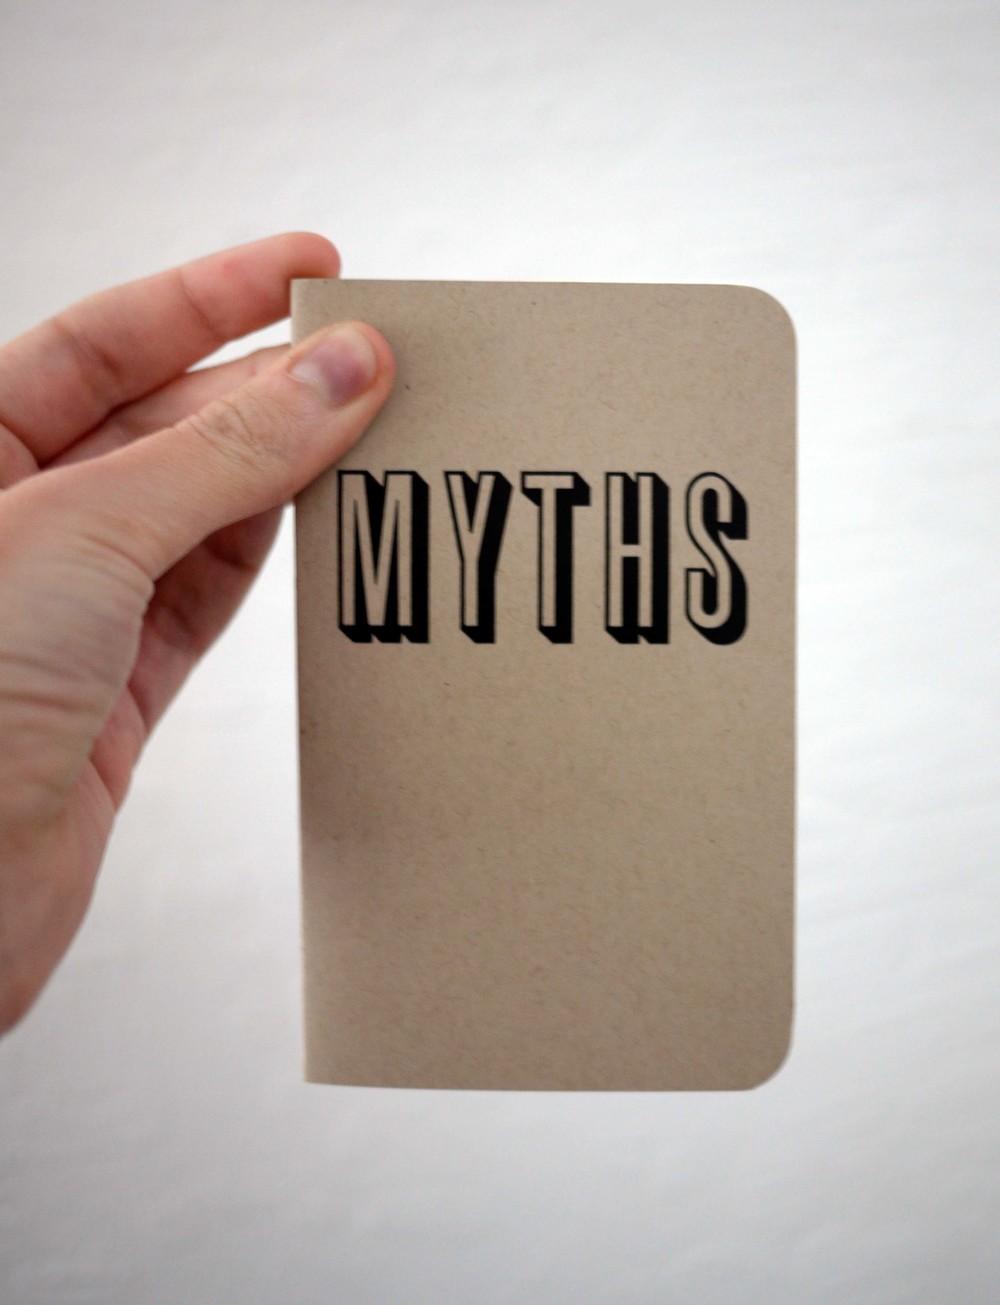 factsmyths2.jpg